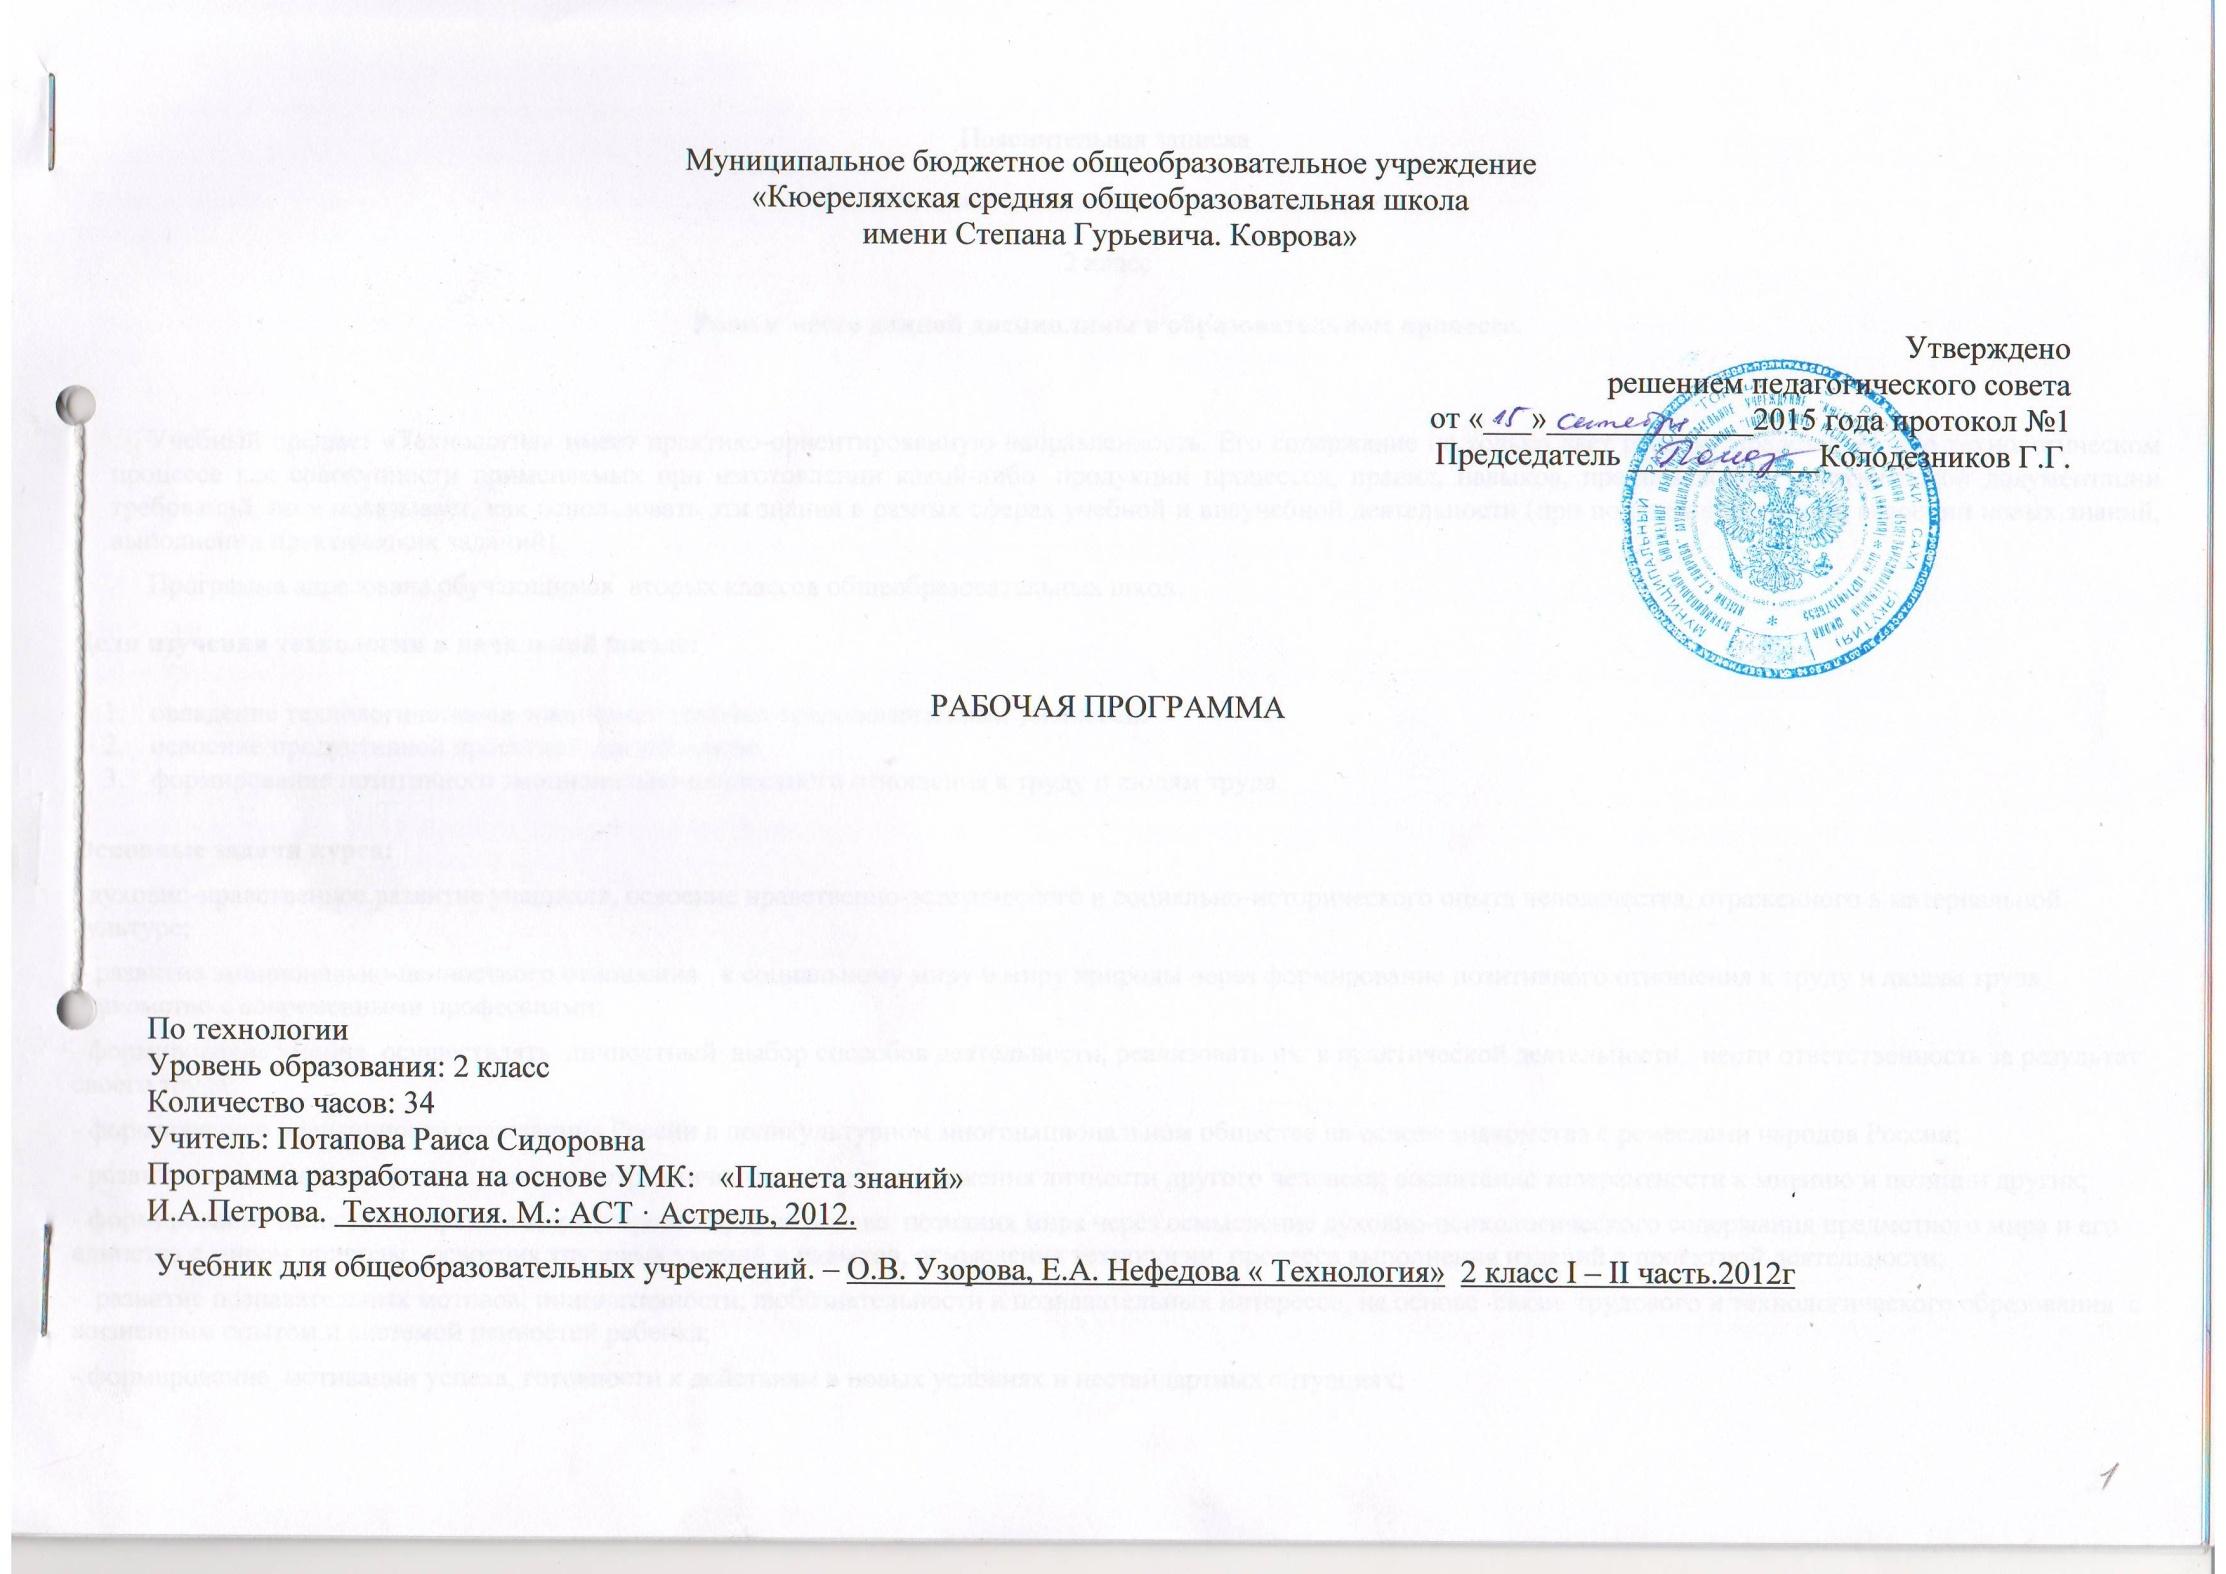 E:\Раиса Сидоровна\2015-2016\10008.JPG